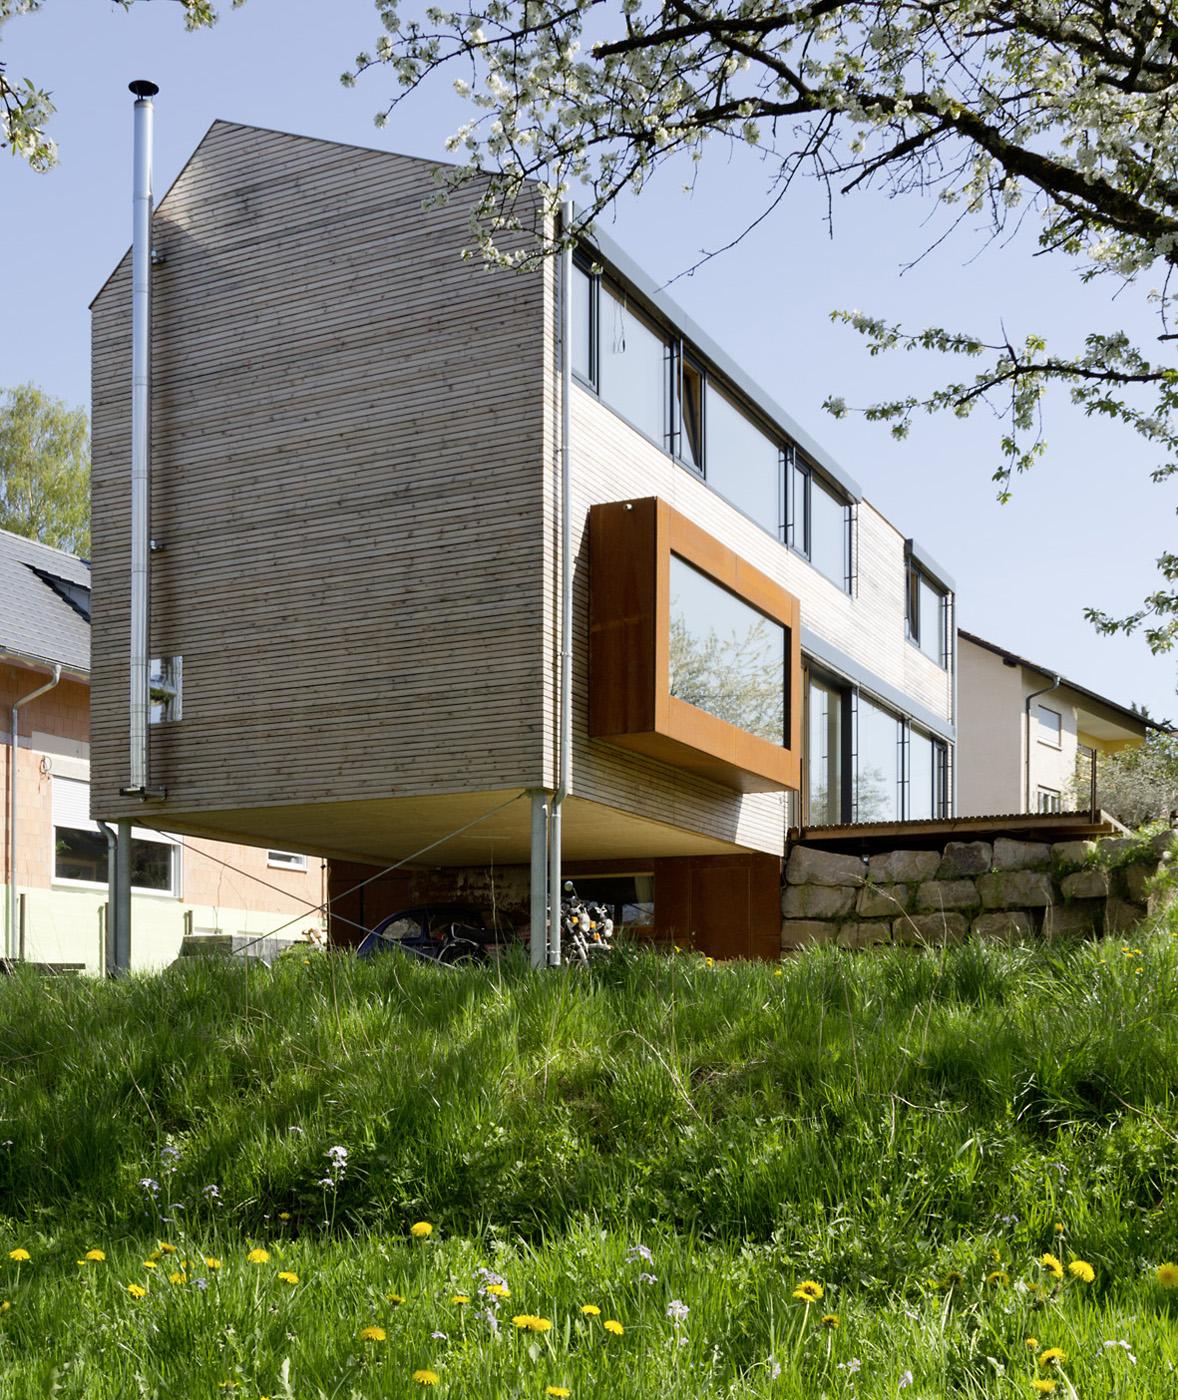 2014 Award Winning House Plans: Cherry Blossom House, Black Forest